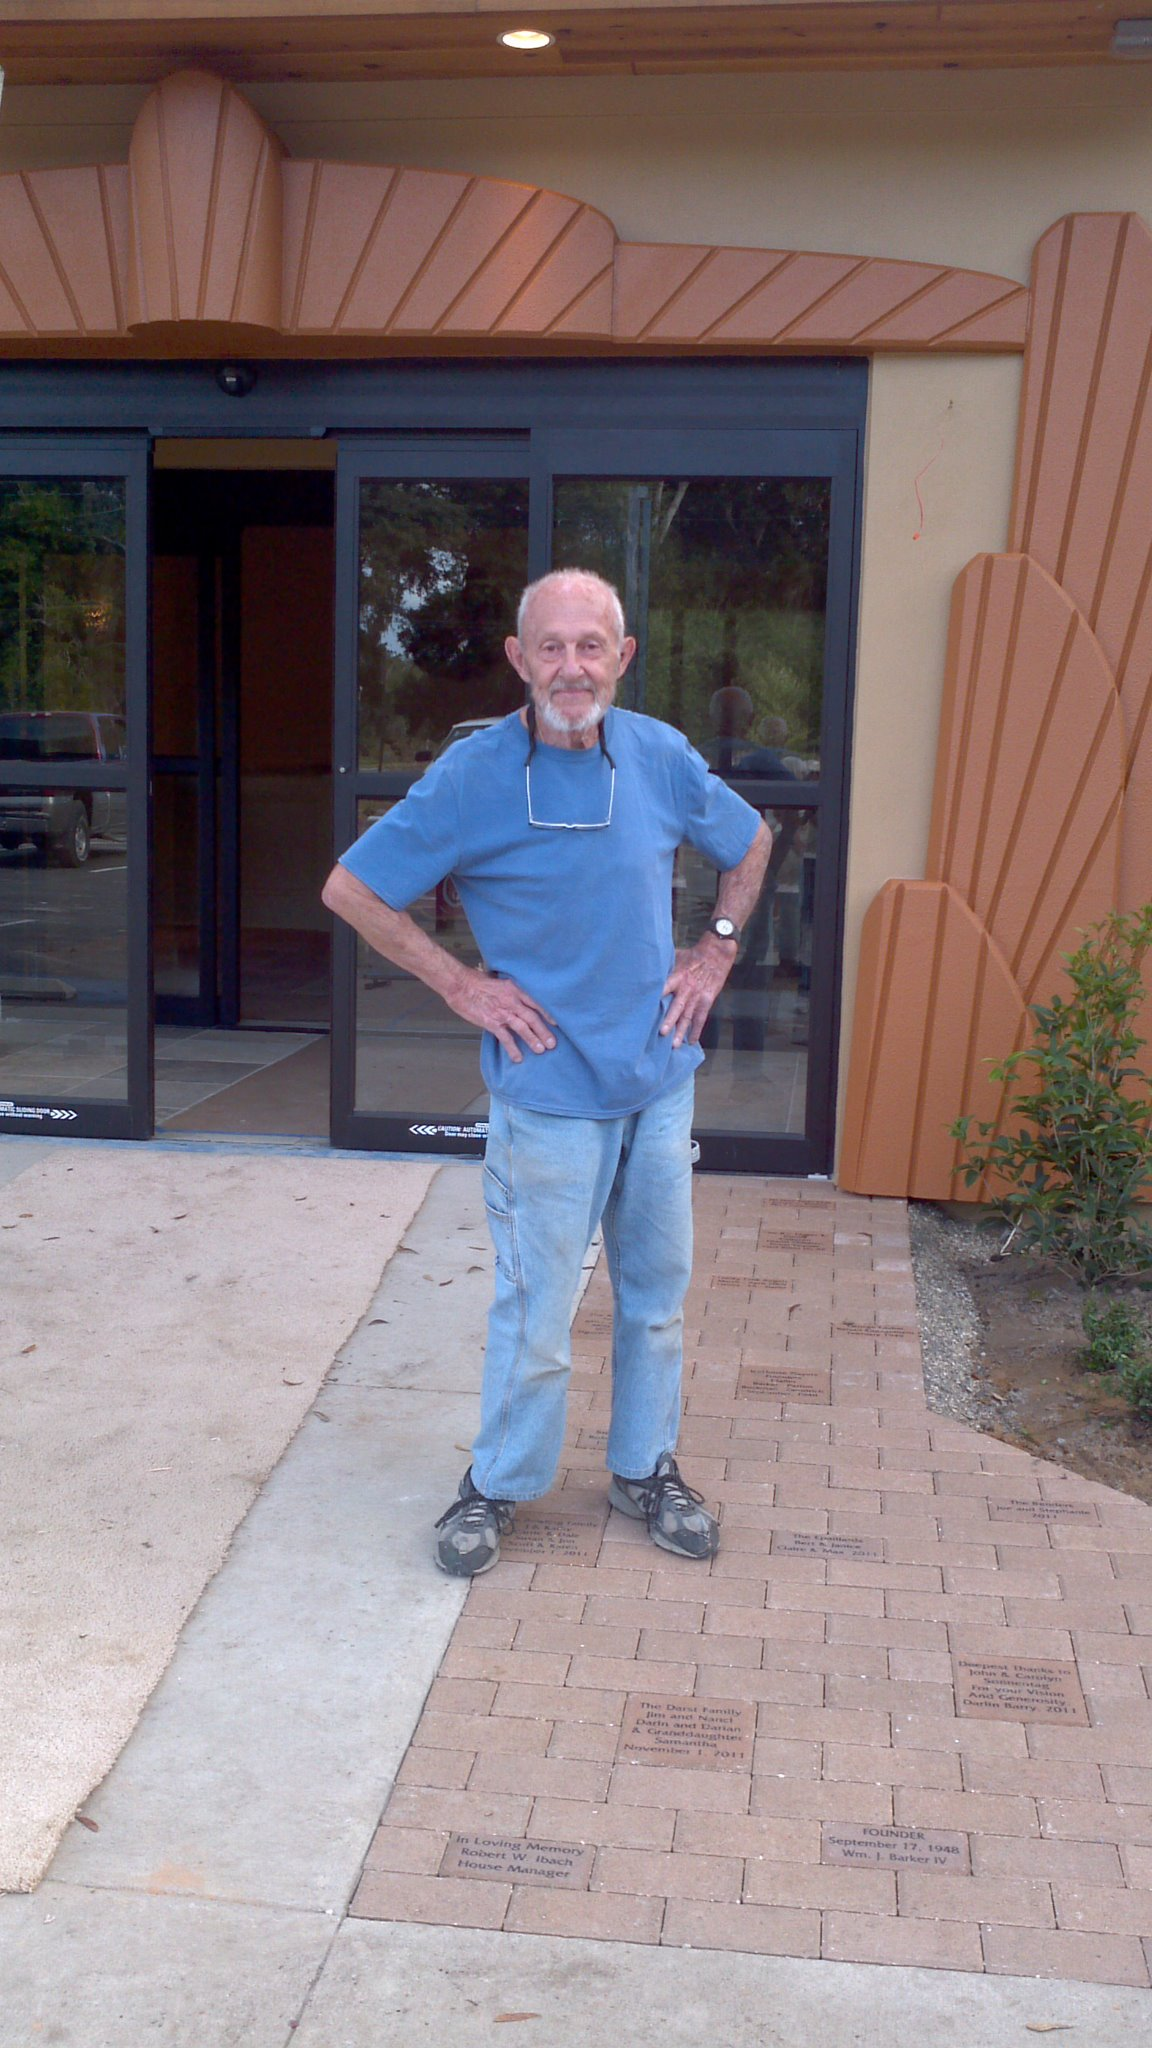 Longtime IceHouse Theatre volunteer Bernie Dedinsky